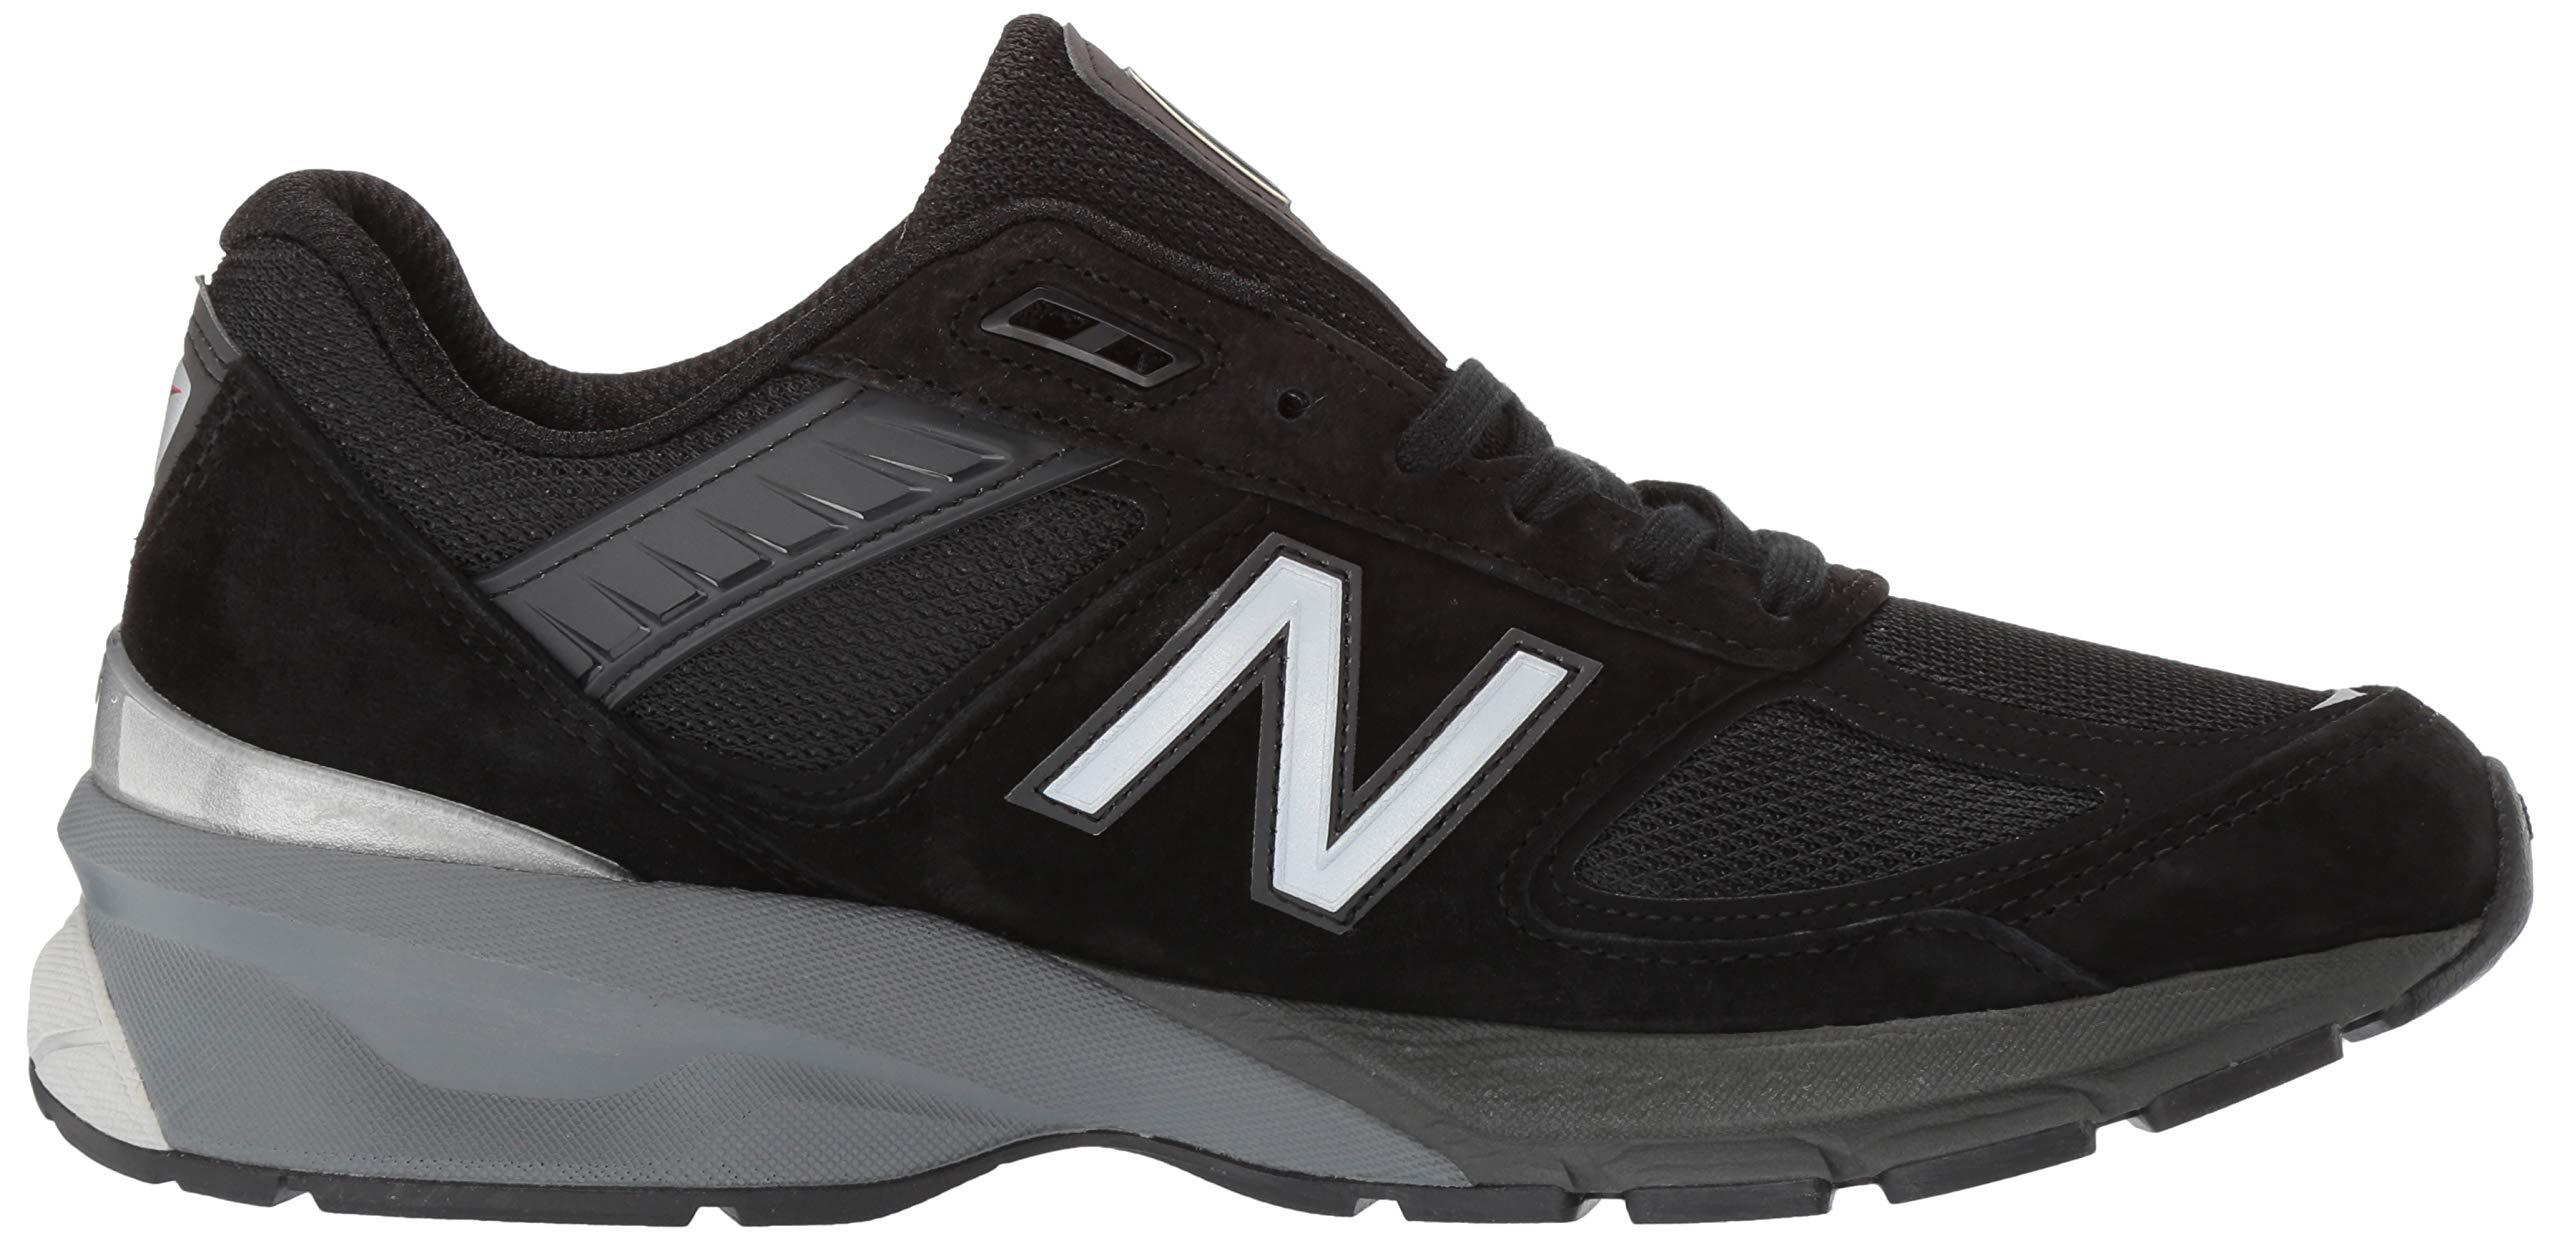 New-Balance-M990v5-Men-039-s-Made-in-USA-GL5-NV5-BK5-BB5 thumbnail 9